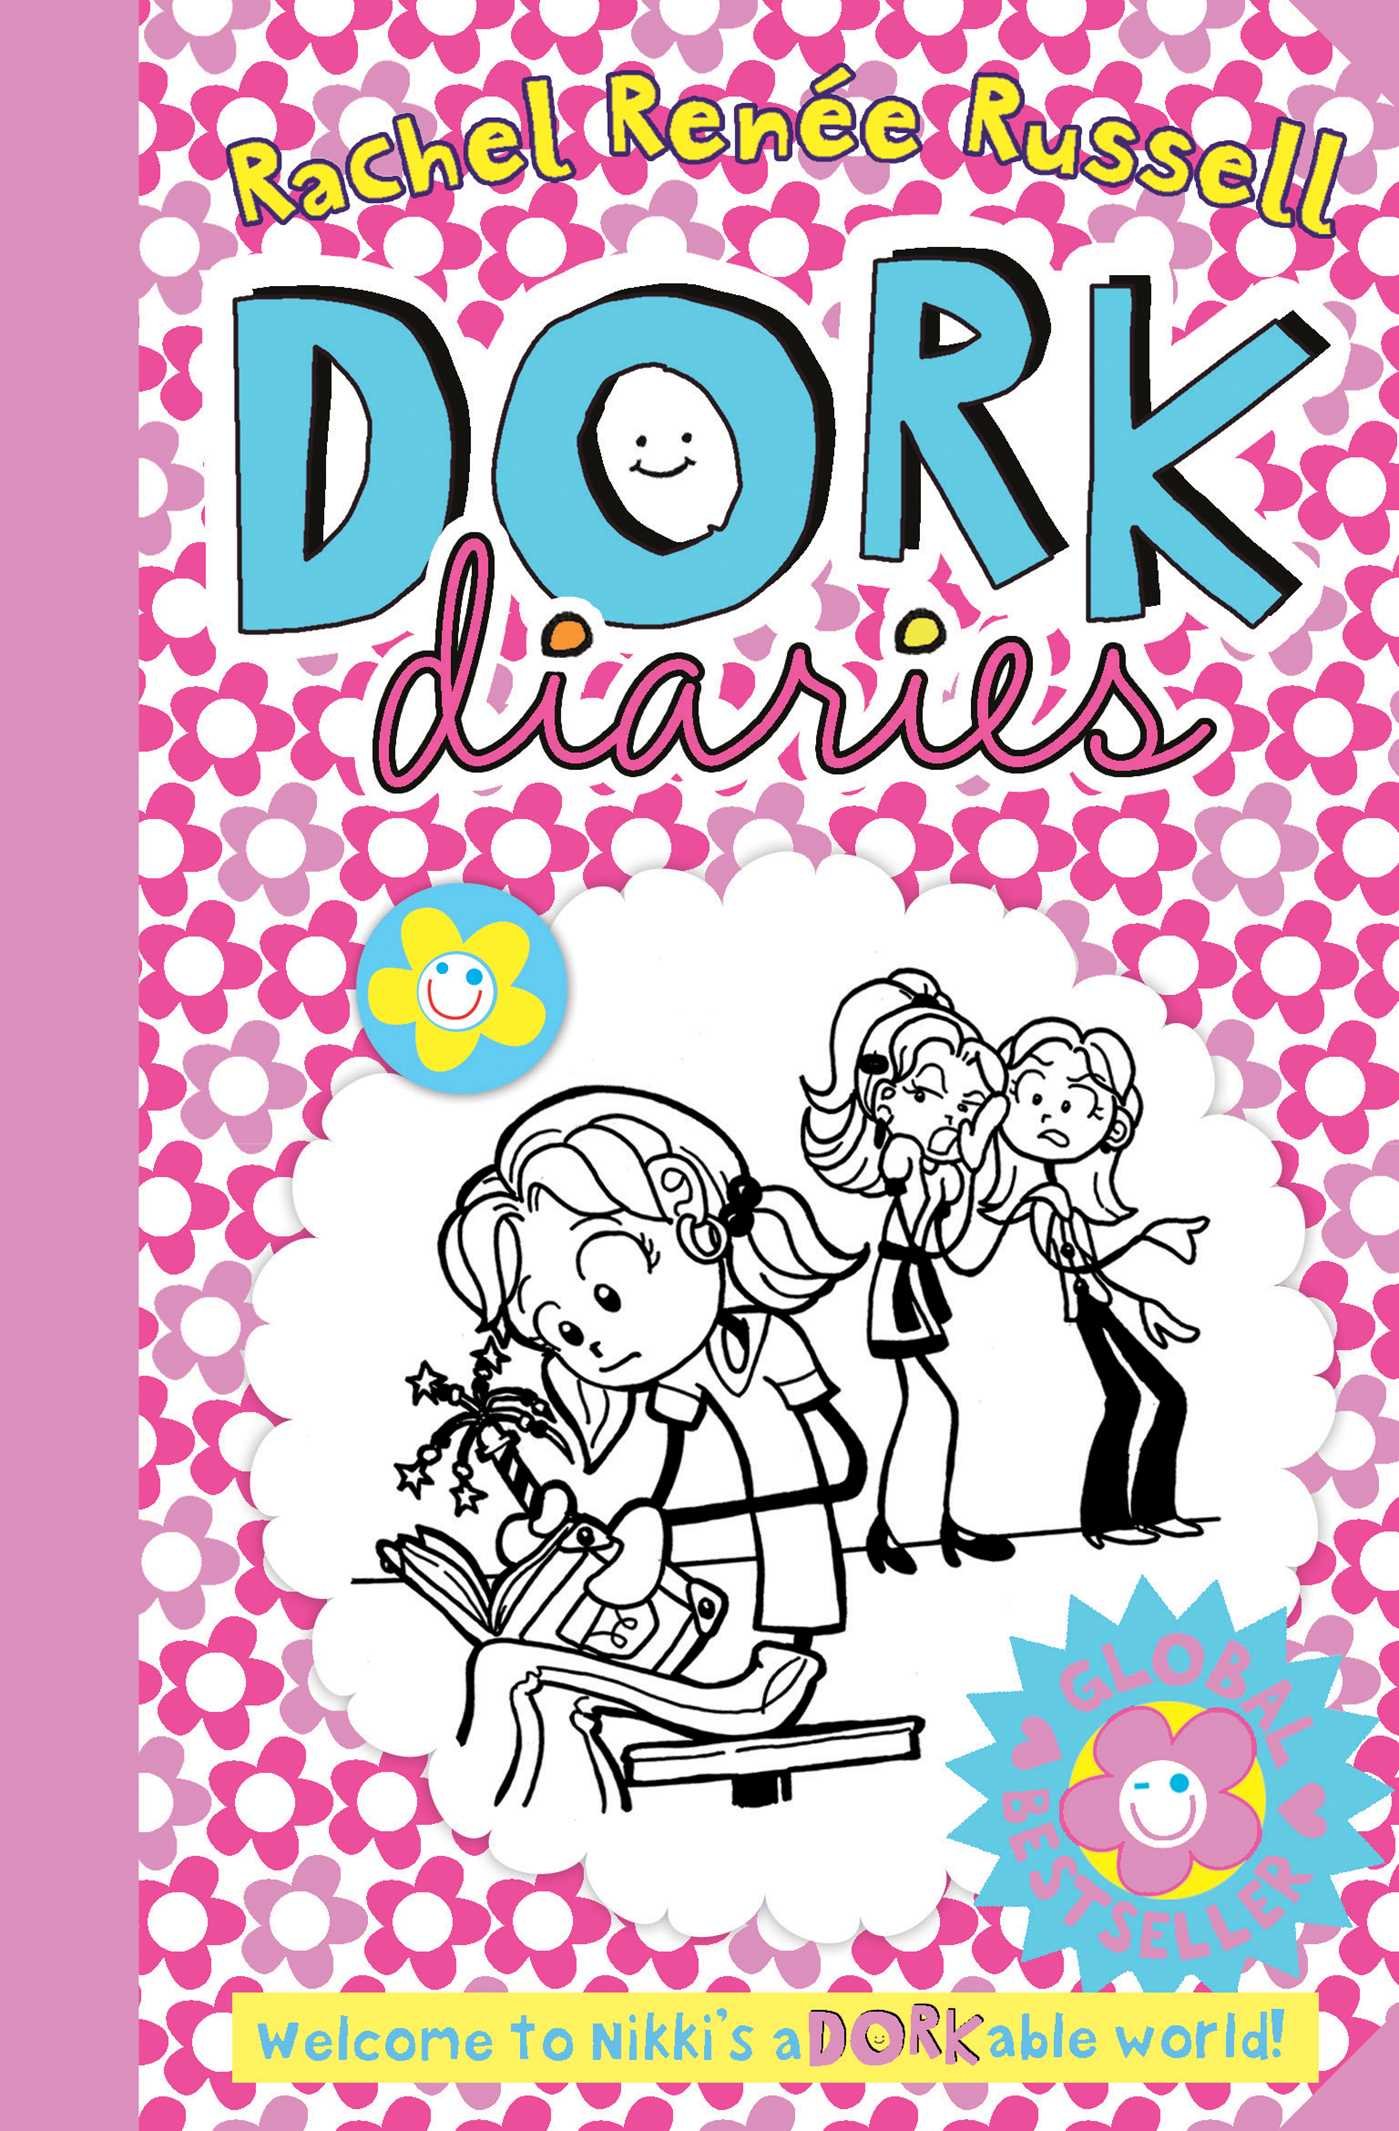 Dork diaries book by rachel renee russell official publisher dork diaries 9781471144011 hr solutioingenieria Images